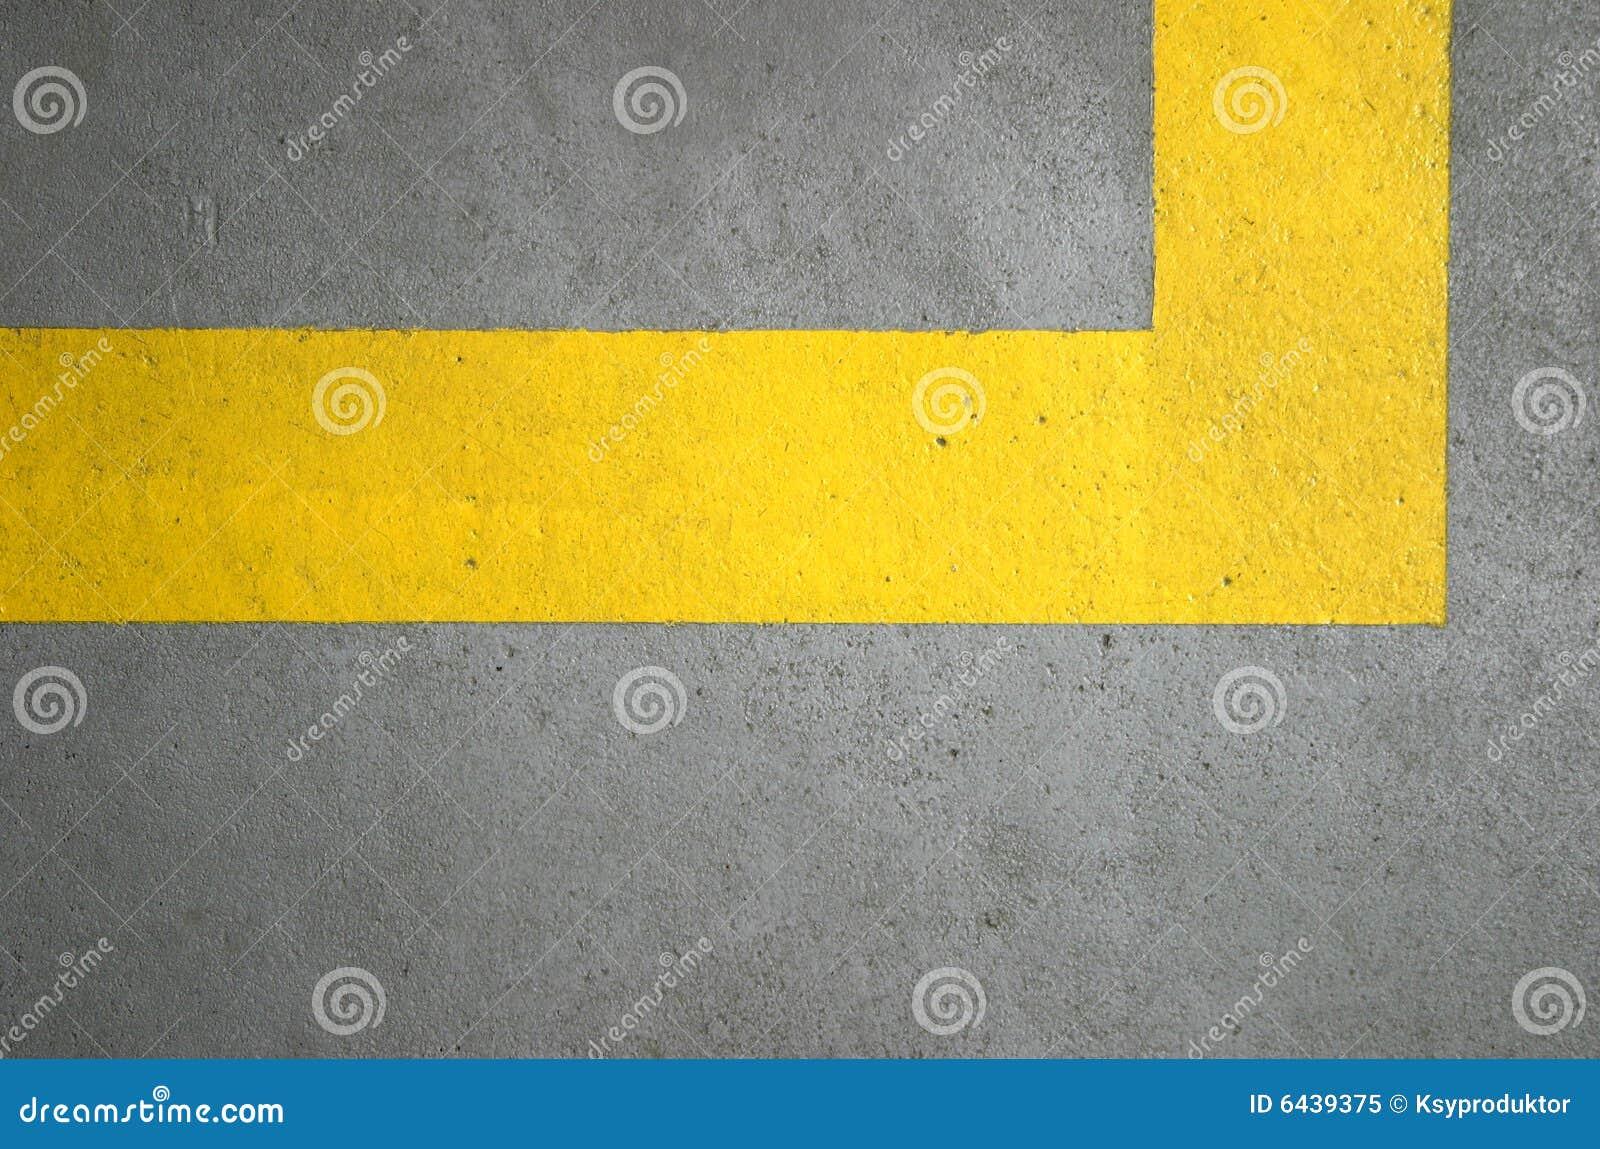 Yellow Lines On Concrete Floor Stock Image Image Of